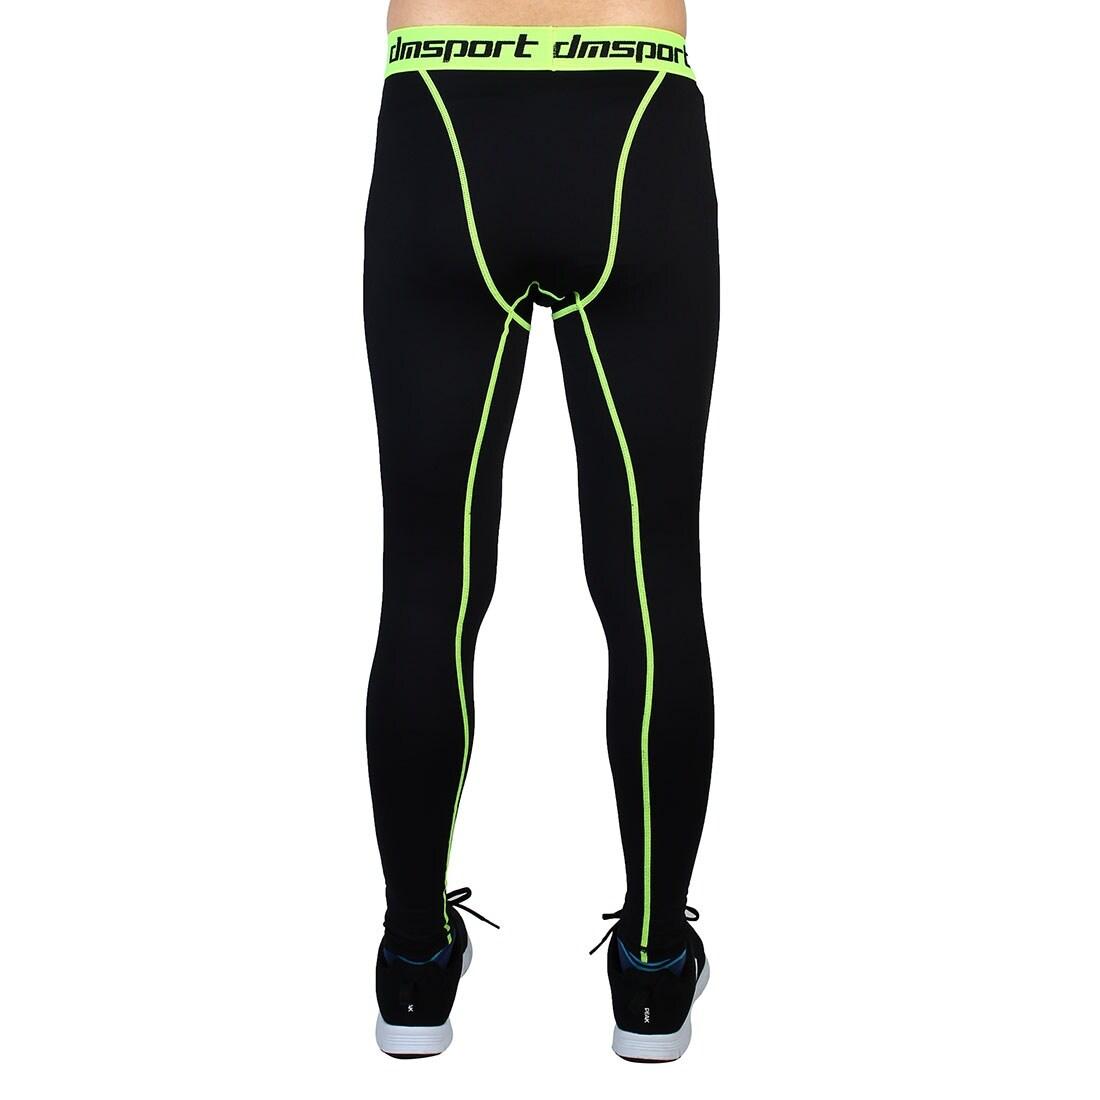 b97347b065cd3 Men Sports Compression Tights Running Long Pants Fluorescence Green W28